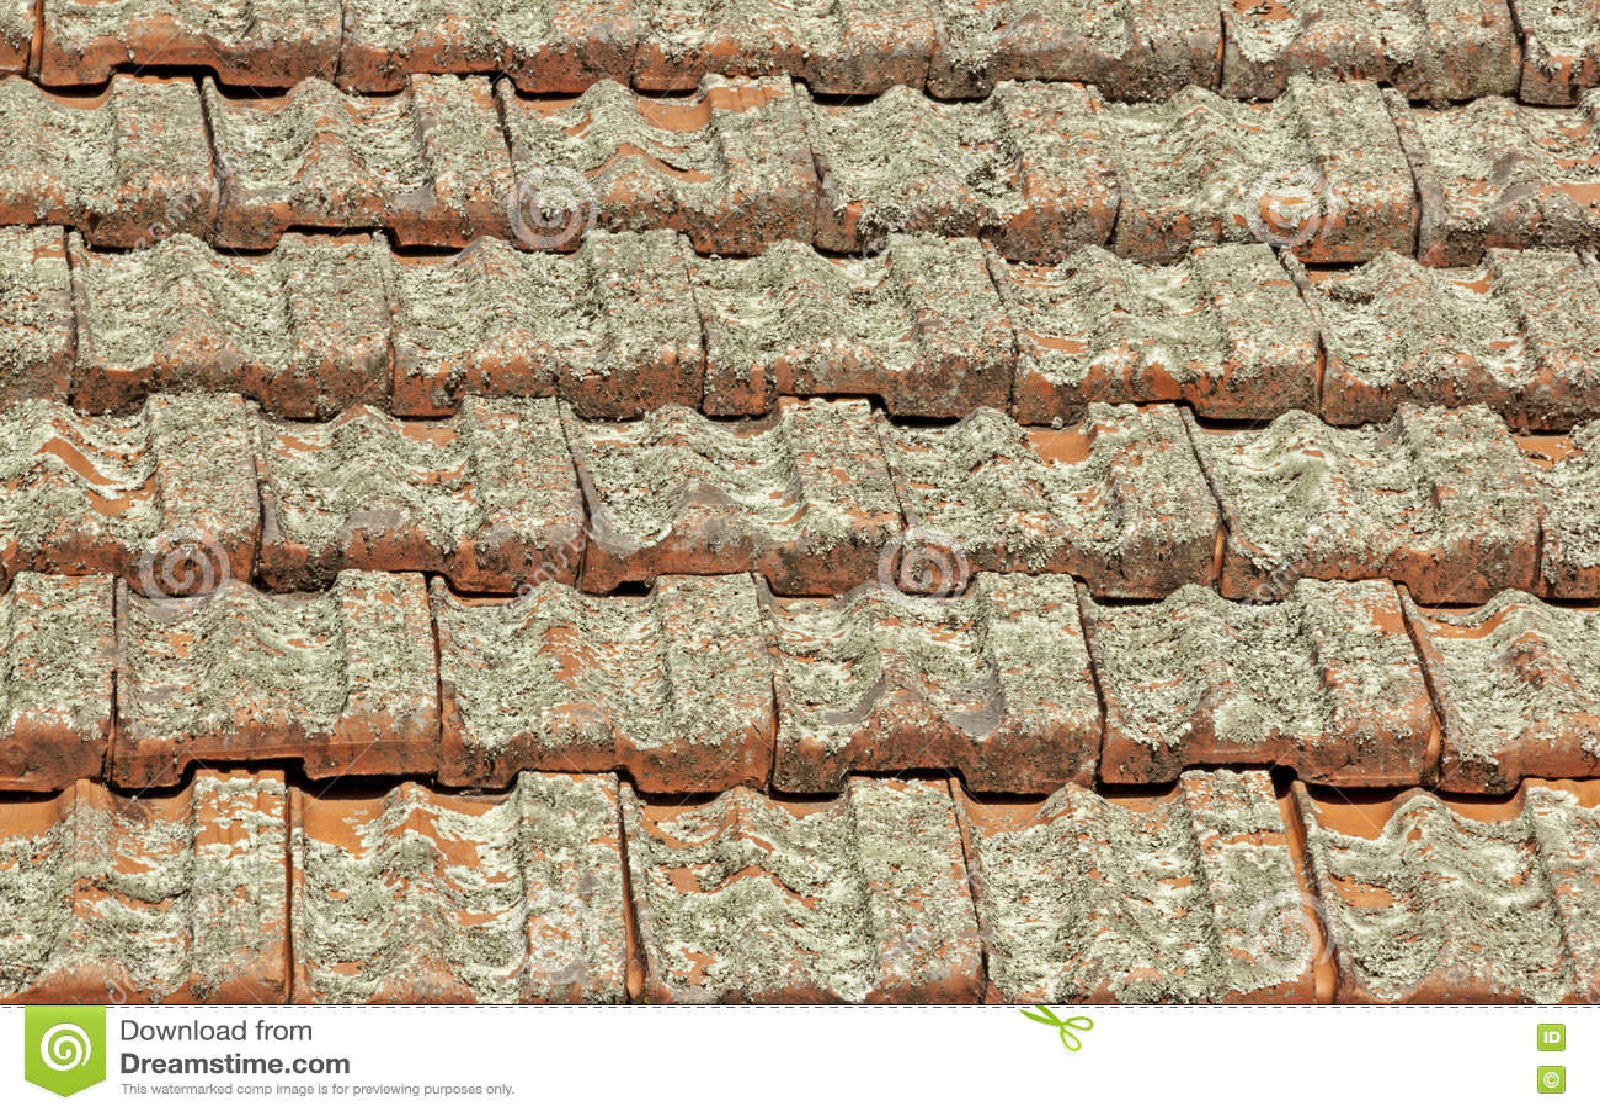 Terrakotta-Dachplatten bedeckt in Lichen Fungus